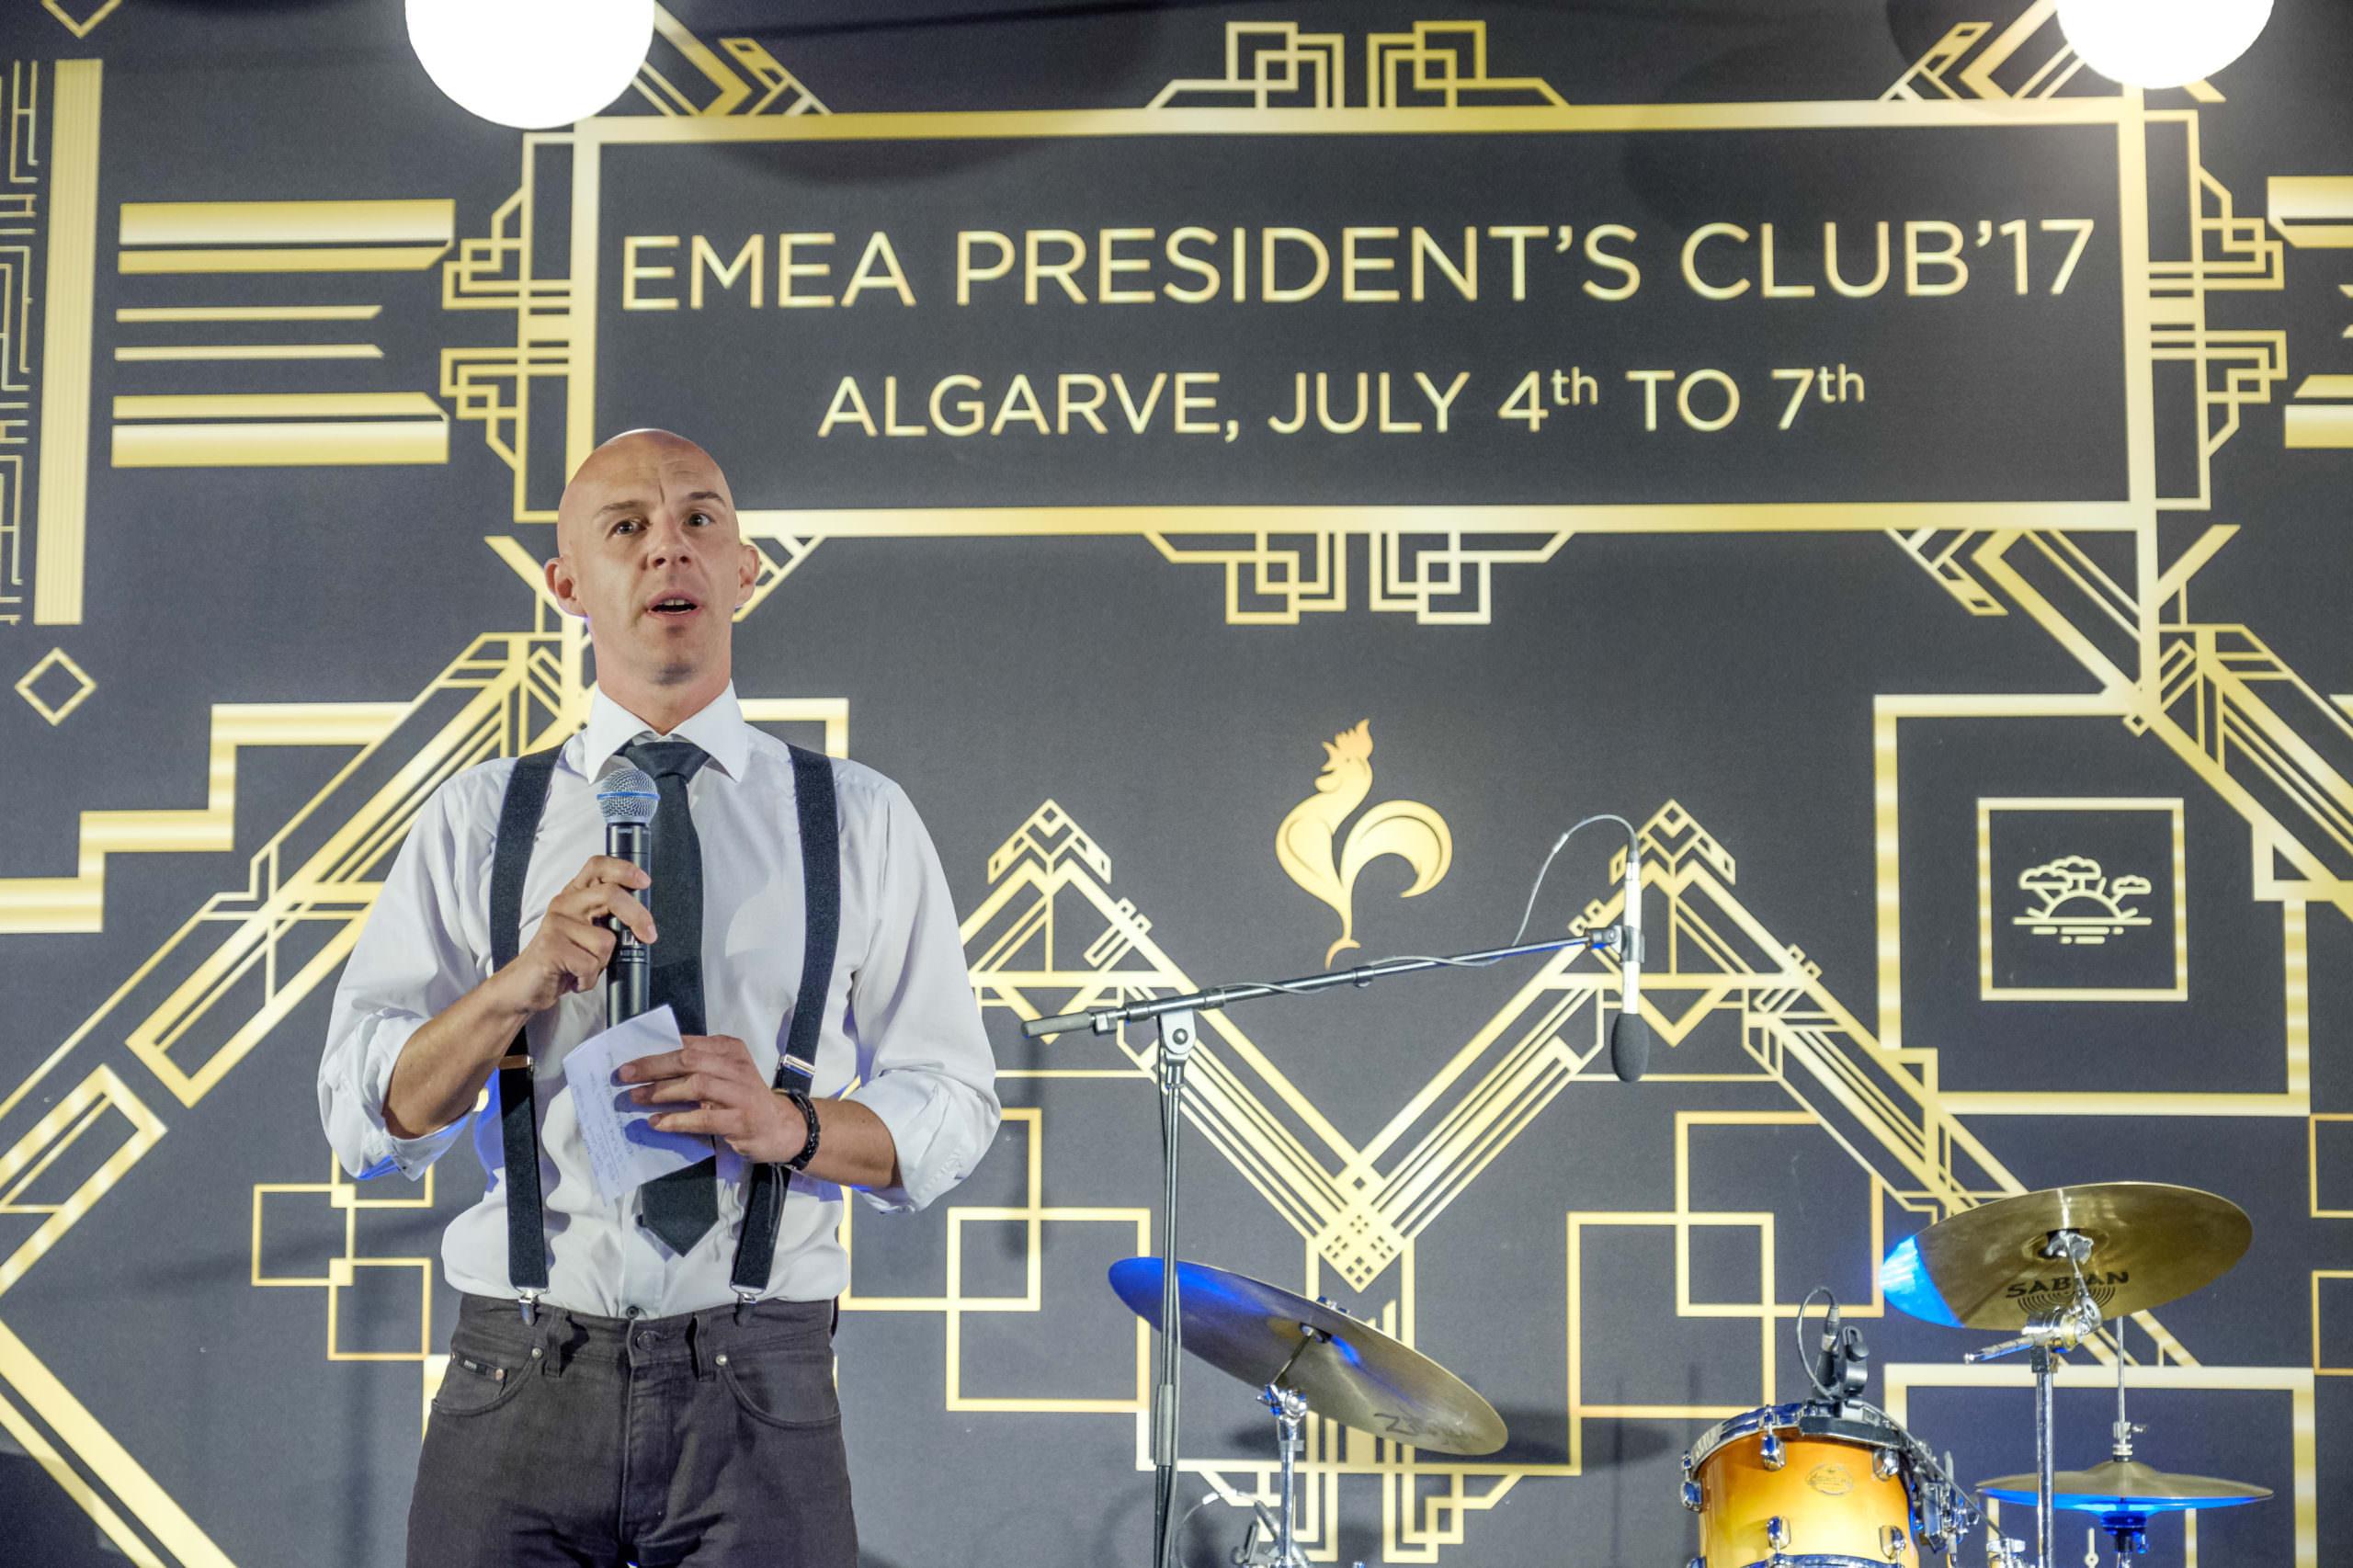 emea-top-100-club-gruppo-peroni-eventi-12